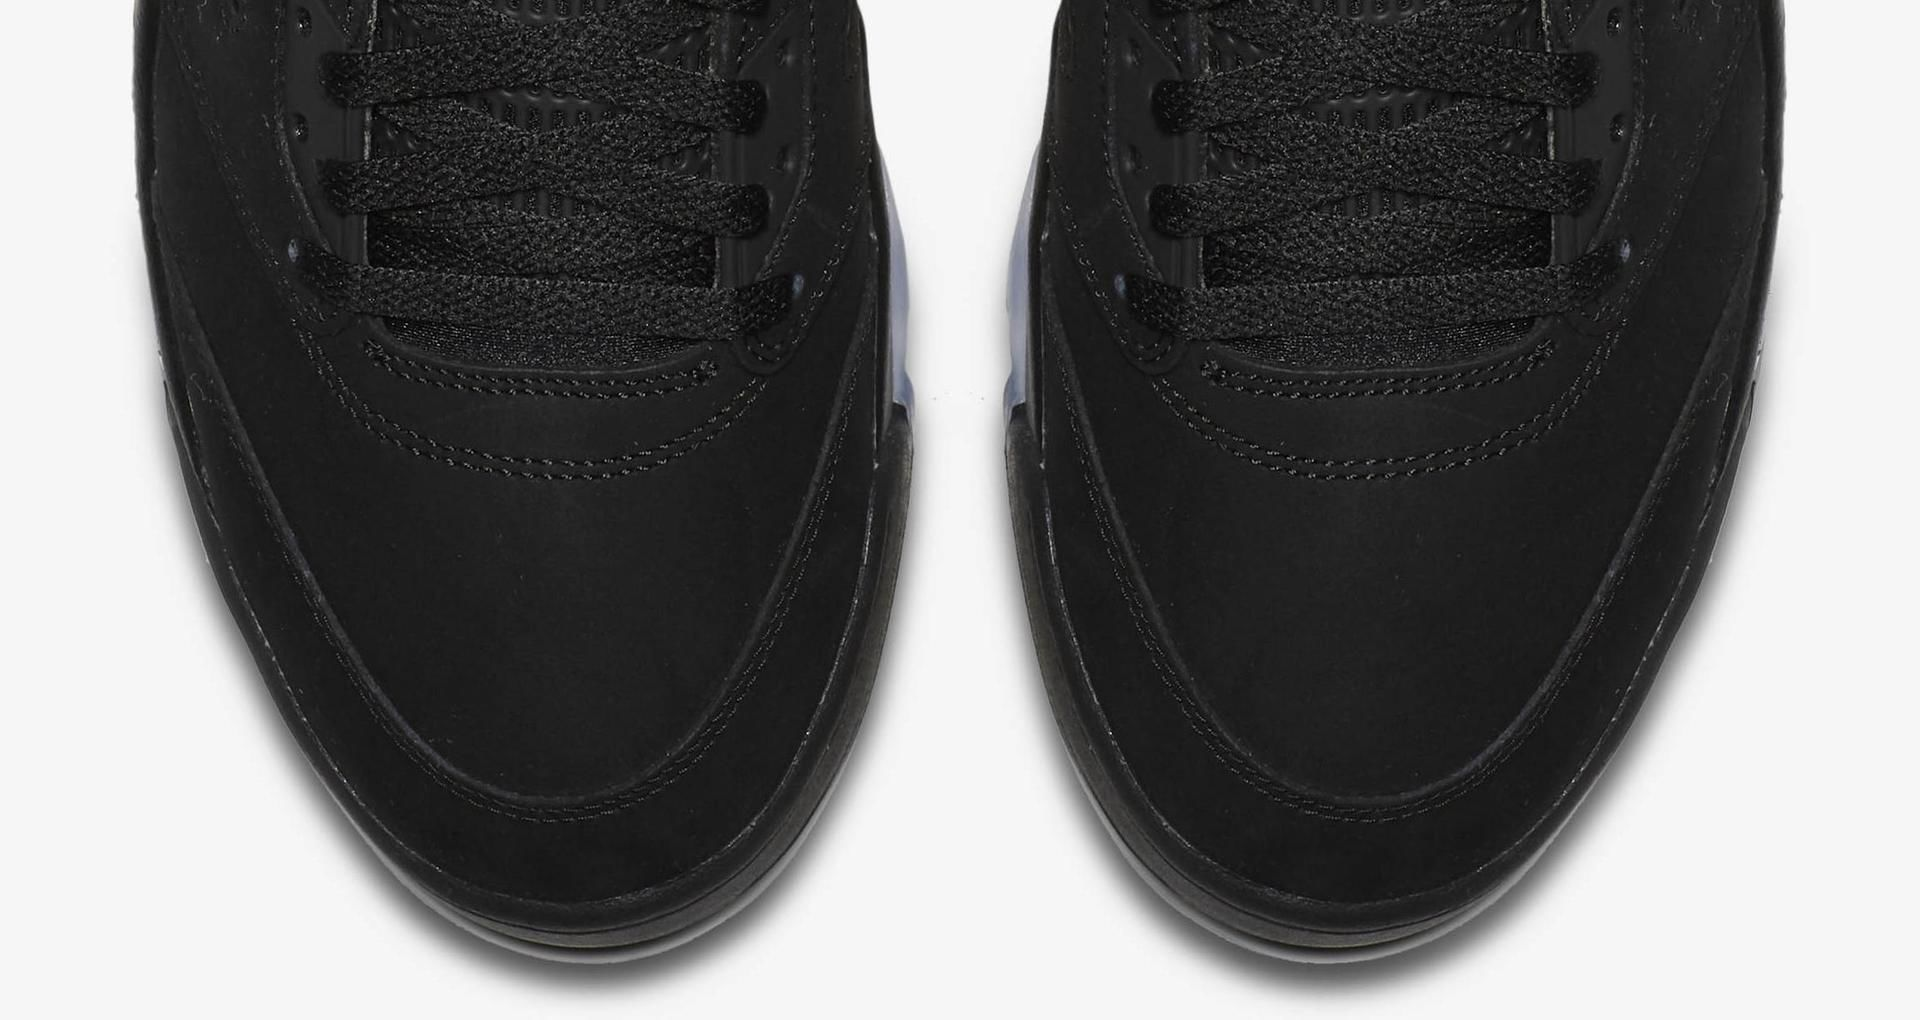 new product 98d0e fb382 Air Jordan 5 PSG ' Black & Challenge Red' Release Date ...